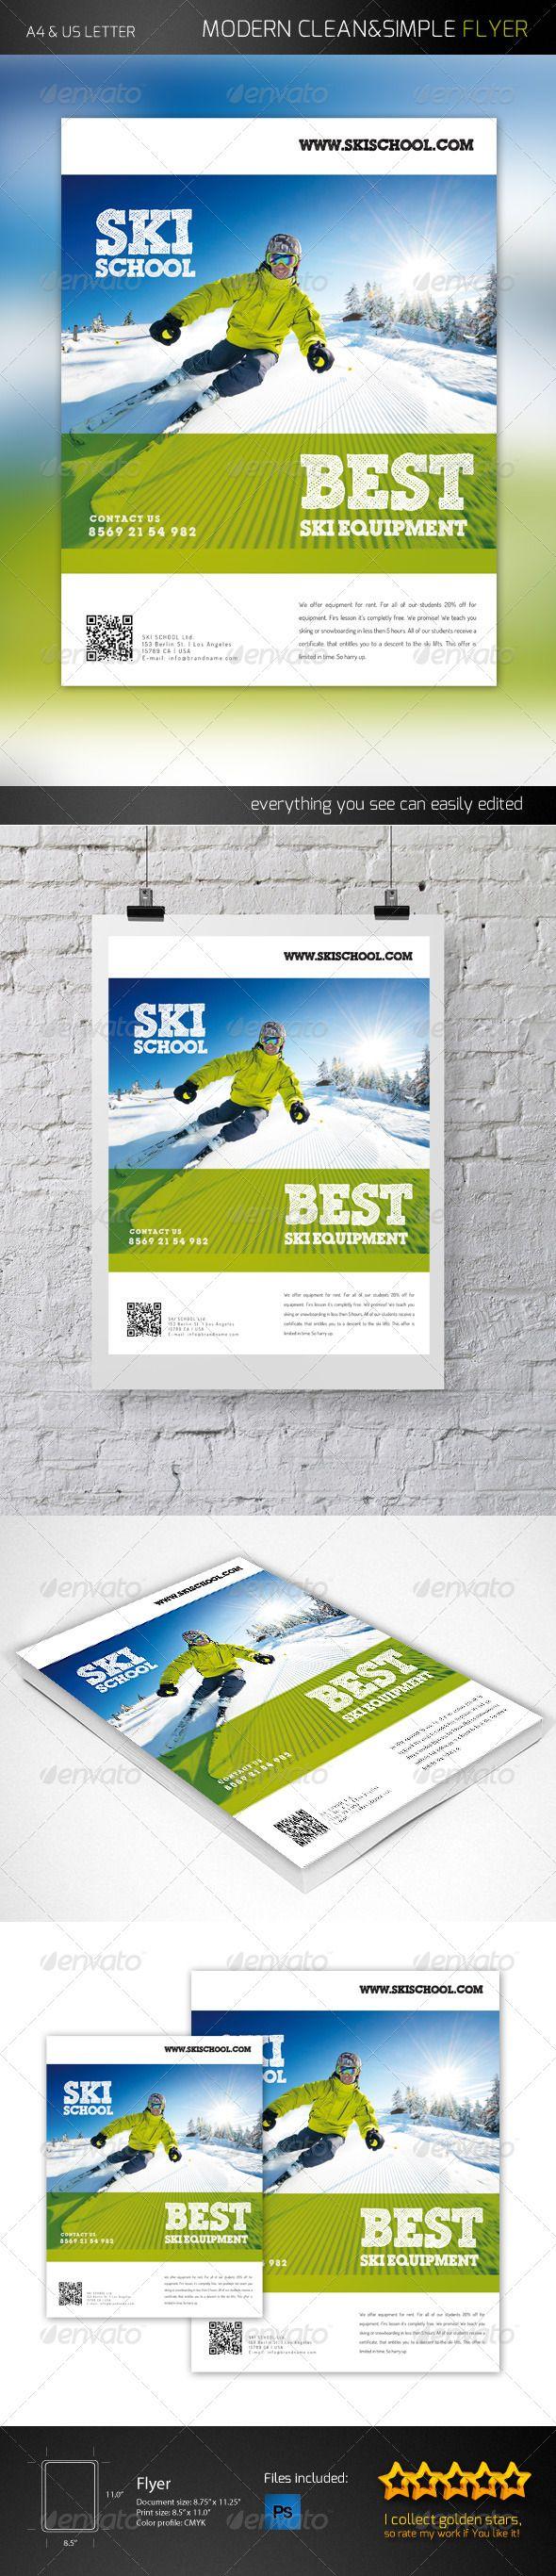 Ski School Flyer Template PSD #design Download: http://graphicriver.net/item/ski-school-flyer/6281683?ref=ksioks